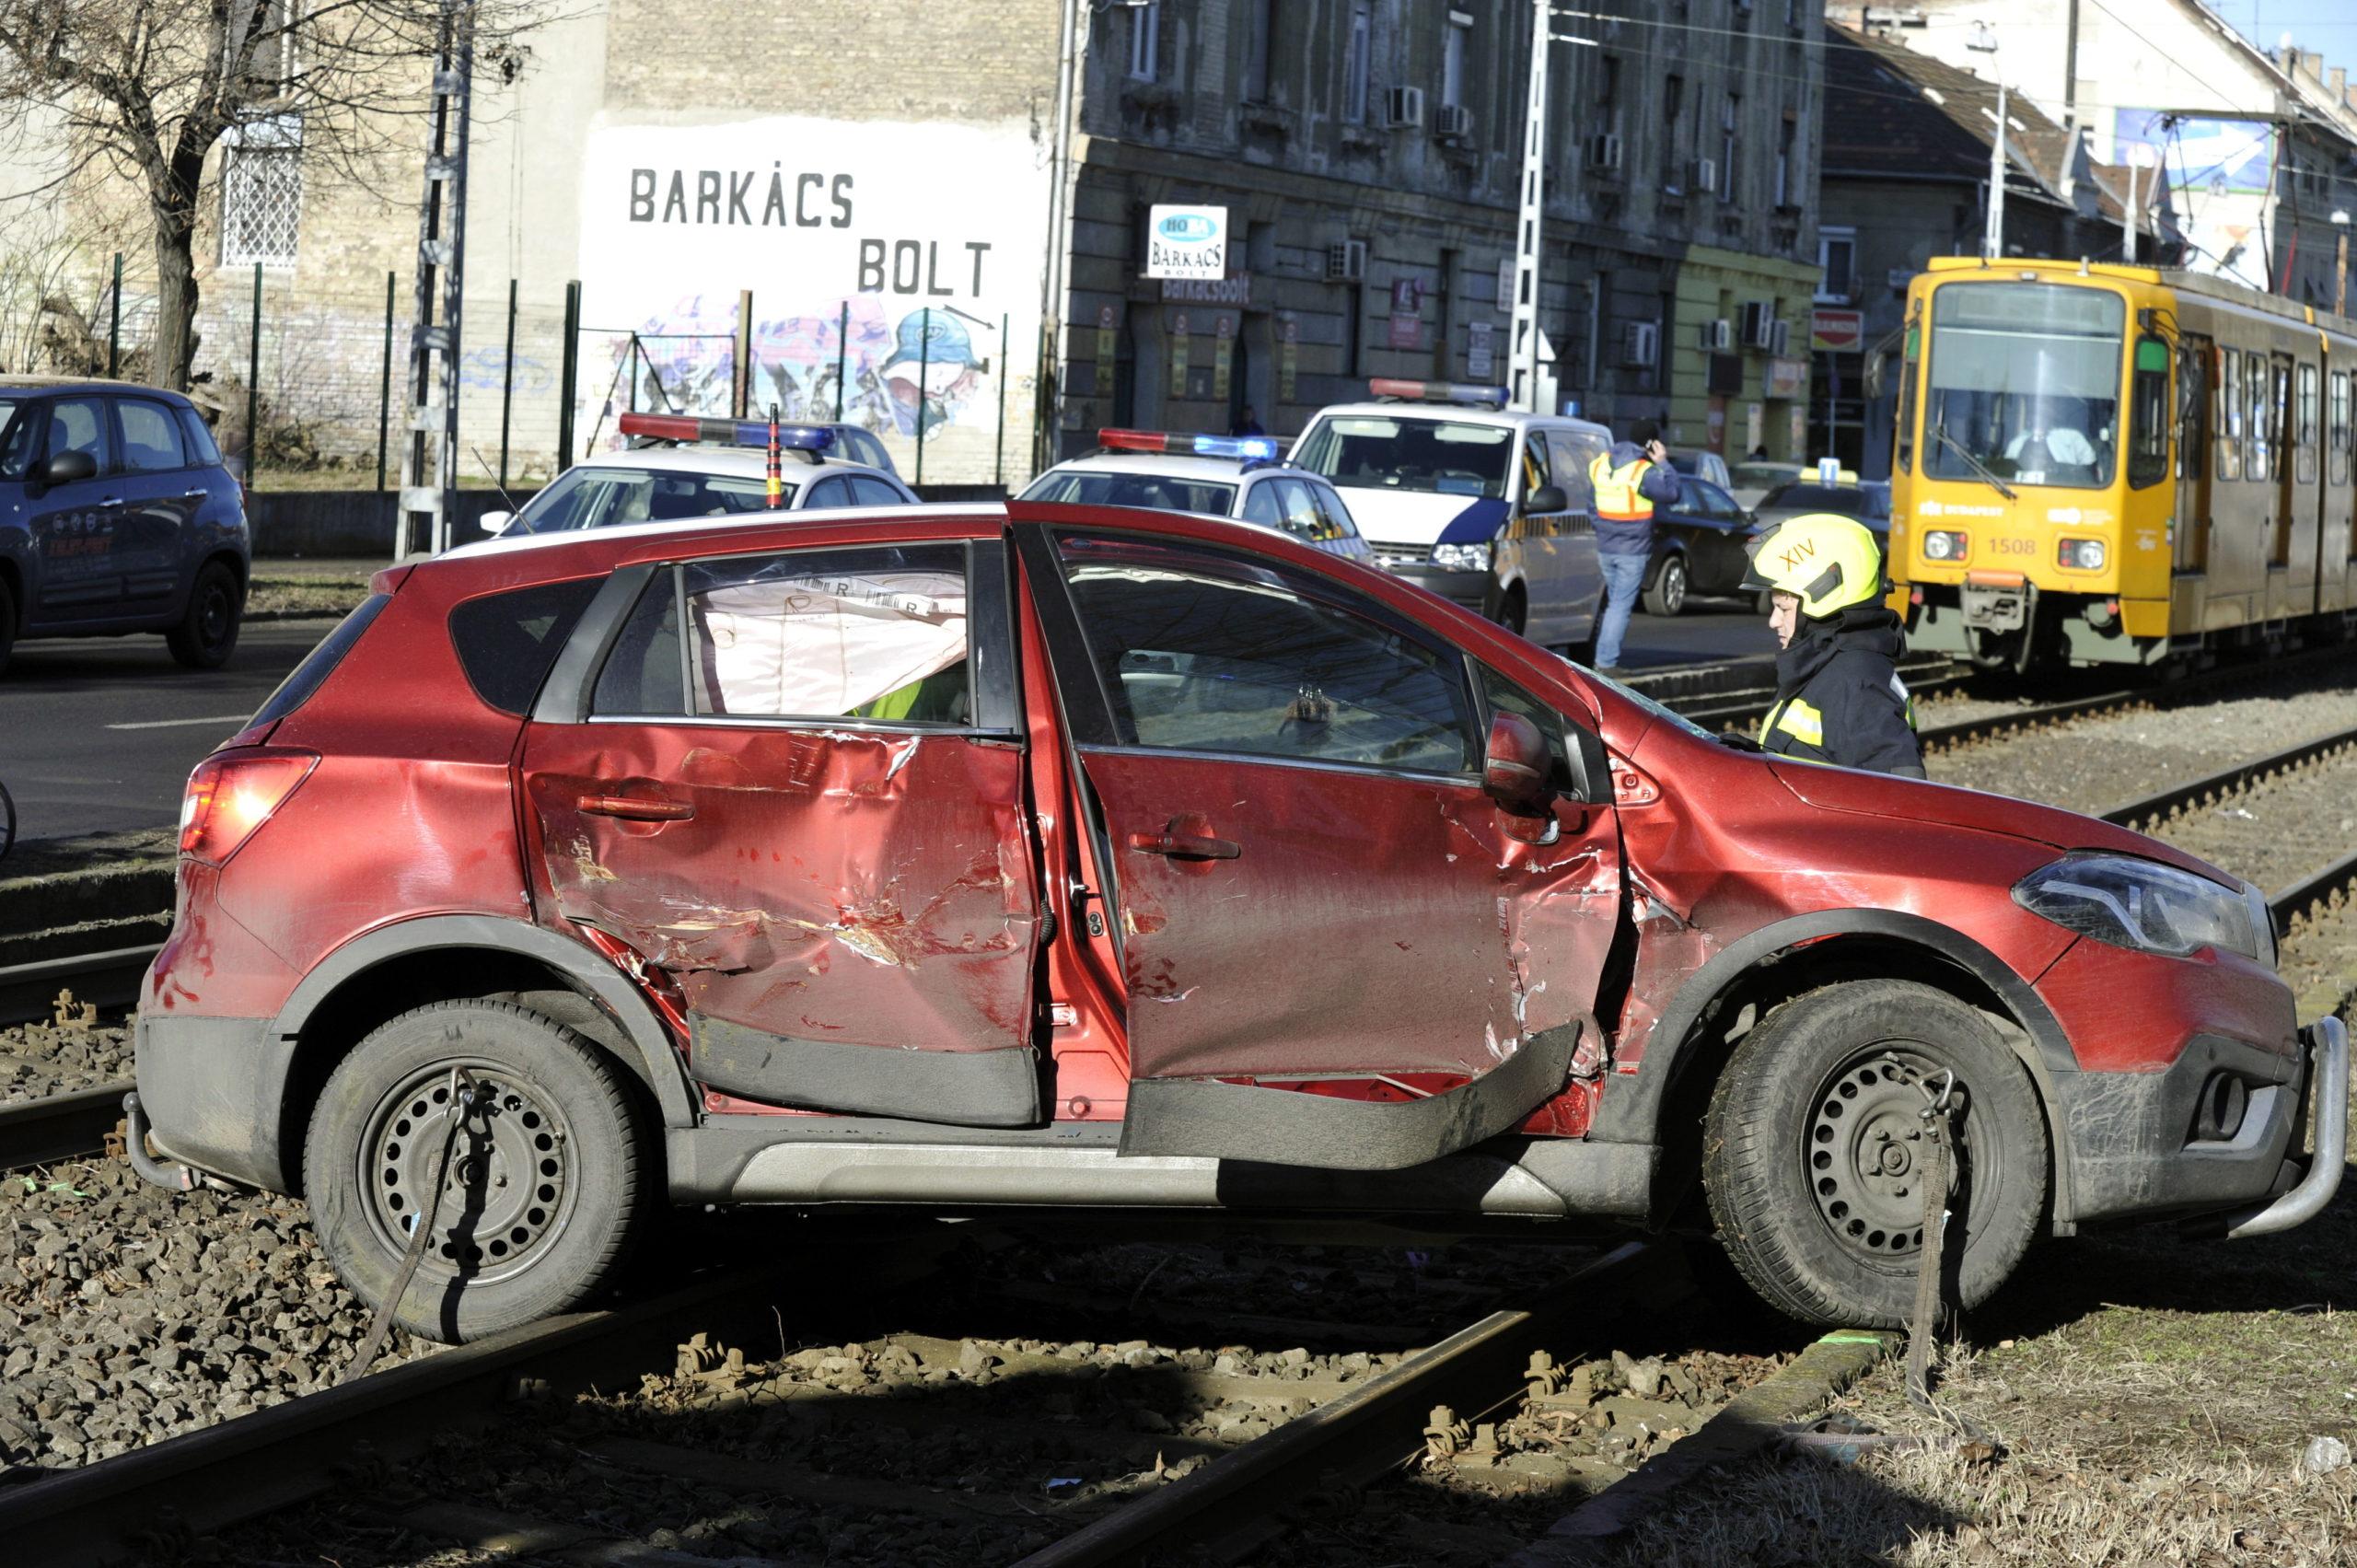 Villamos ütközött autóssal